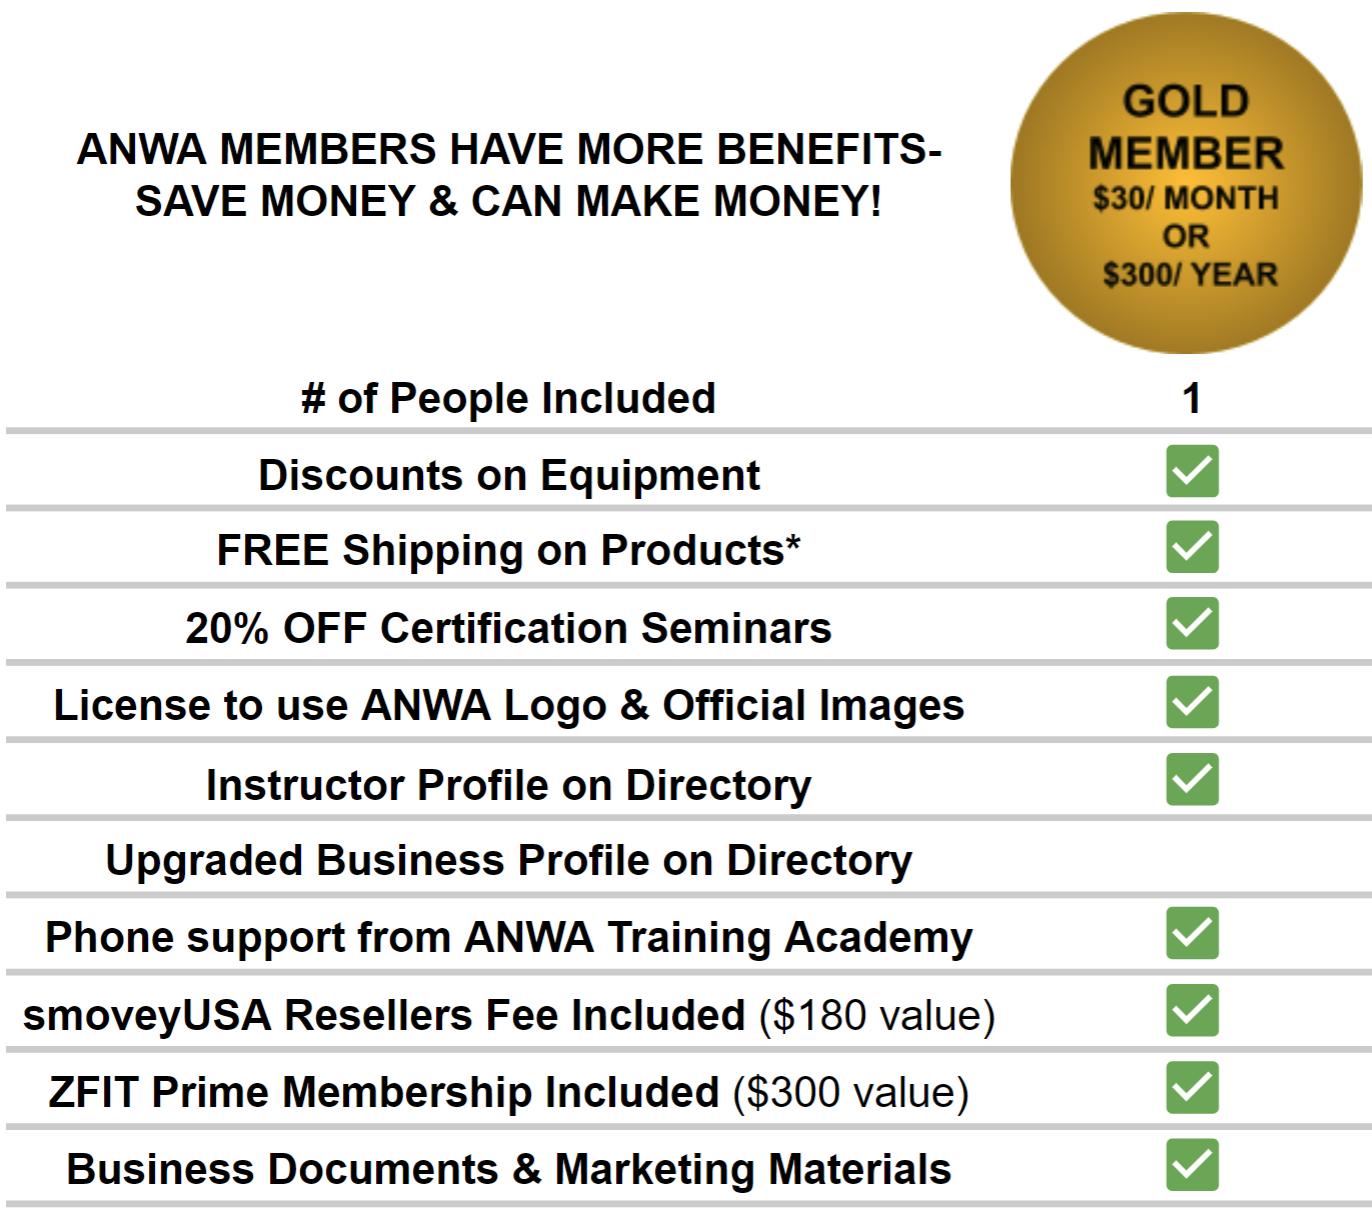 Nordic Walking Online ANWA Membership Package- Gold Member